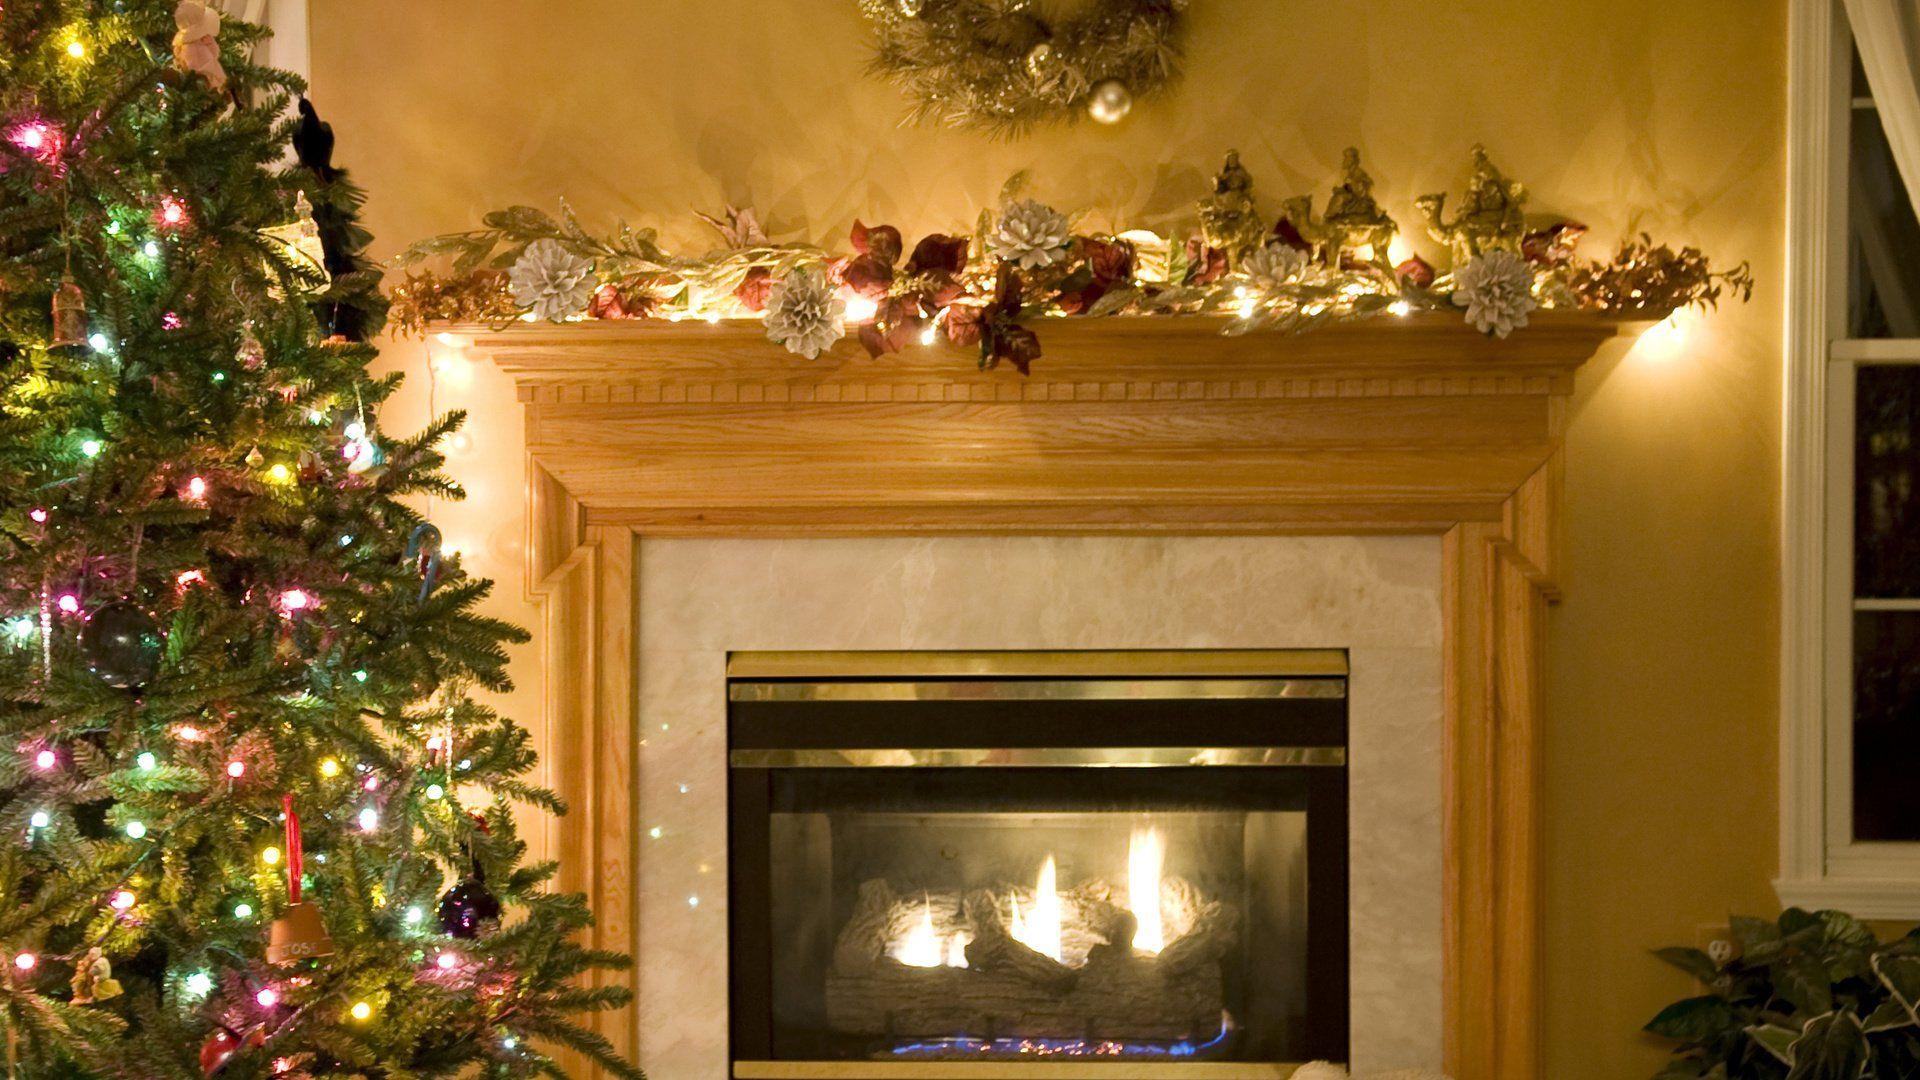 Christmas Fireplace Comfort Full HD Wallpaper